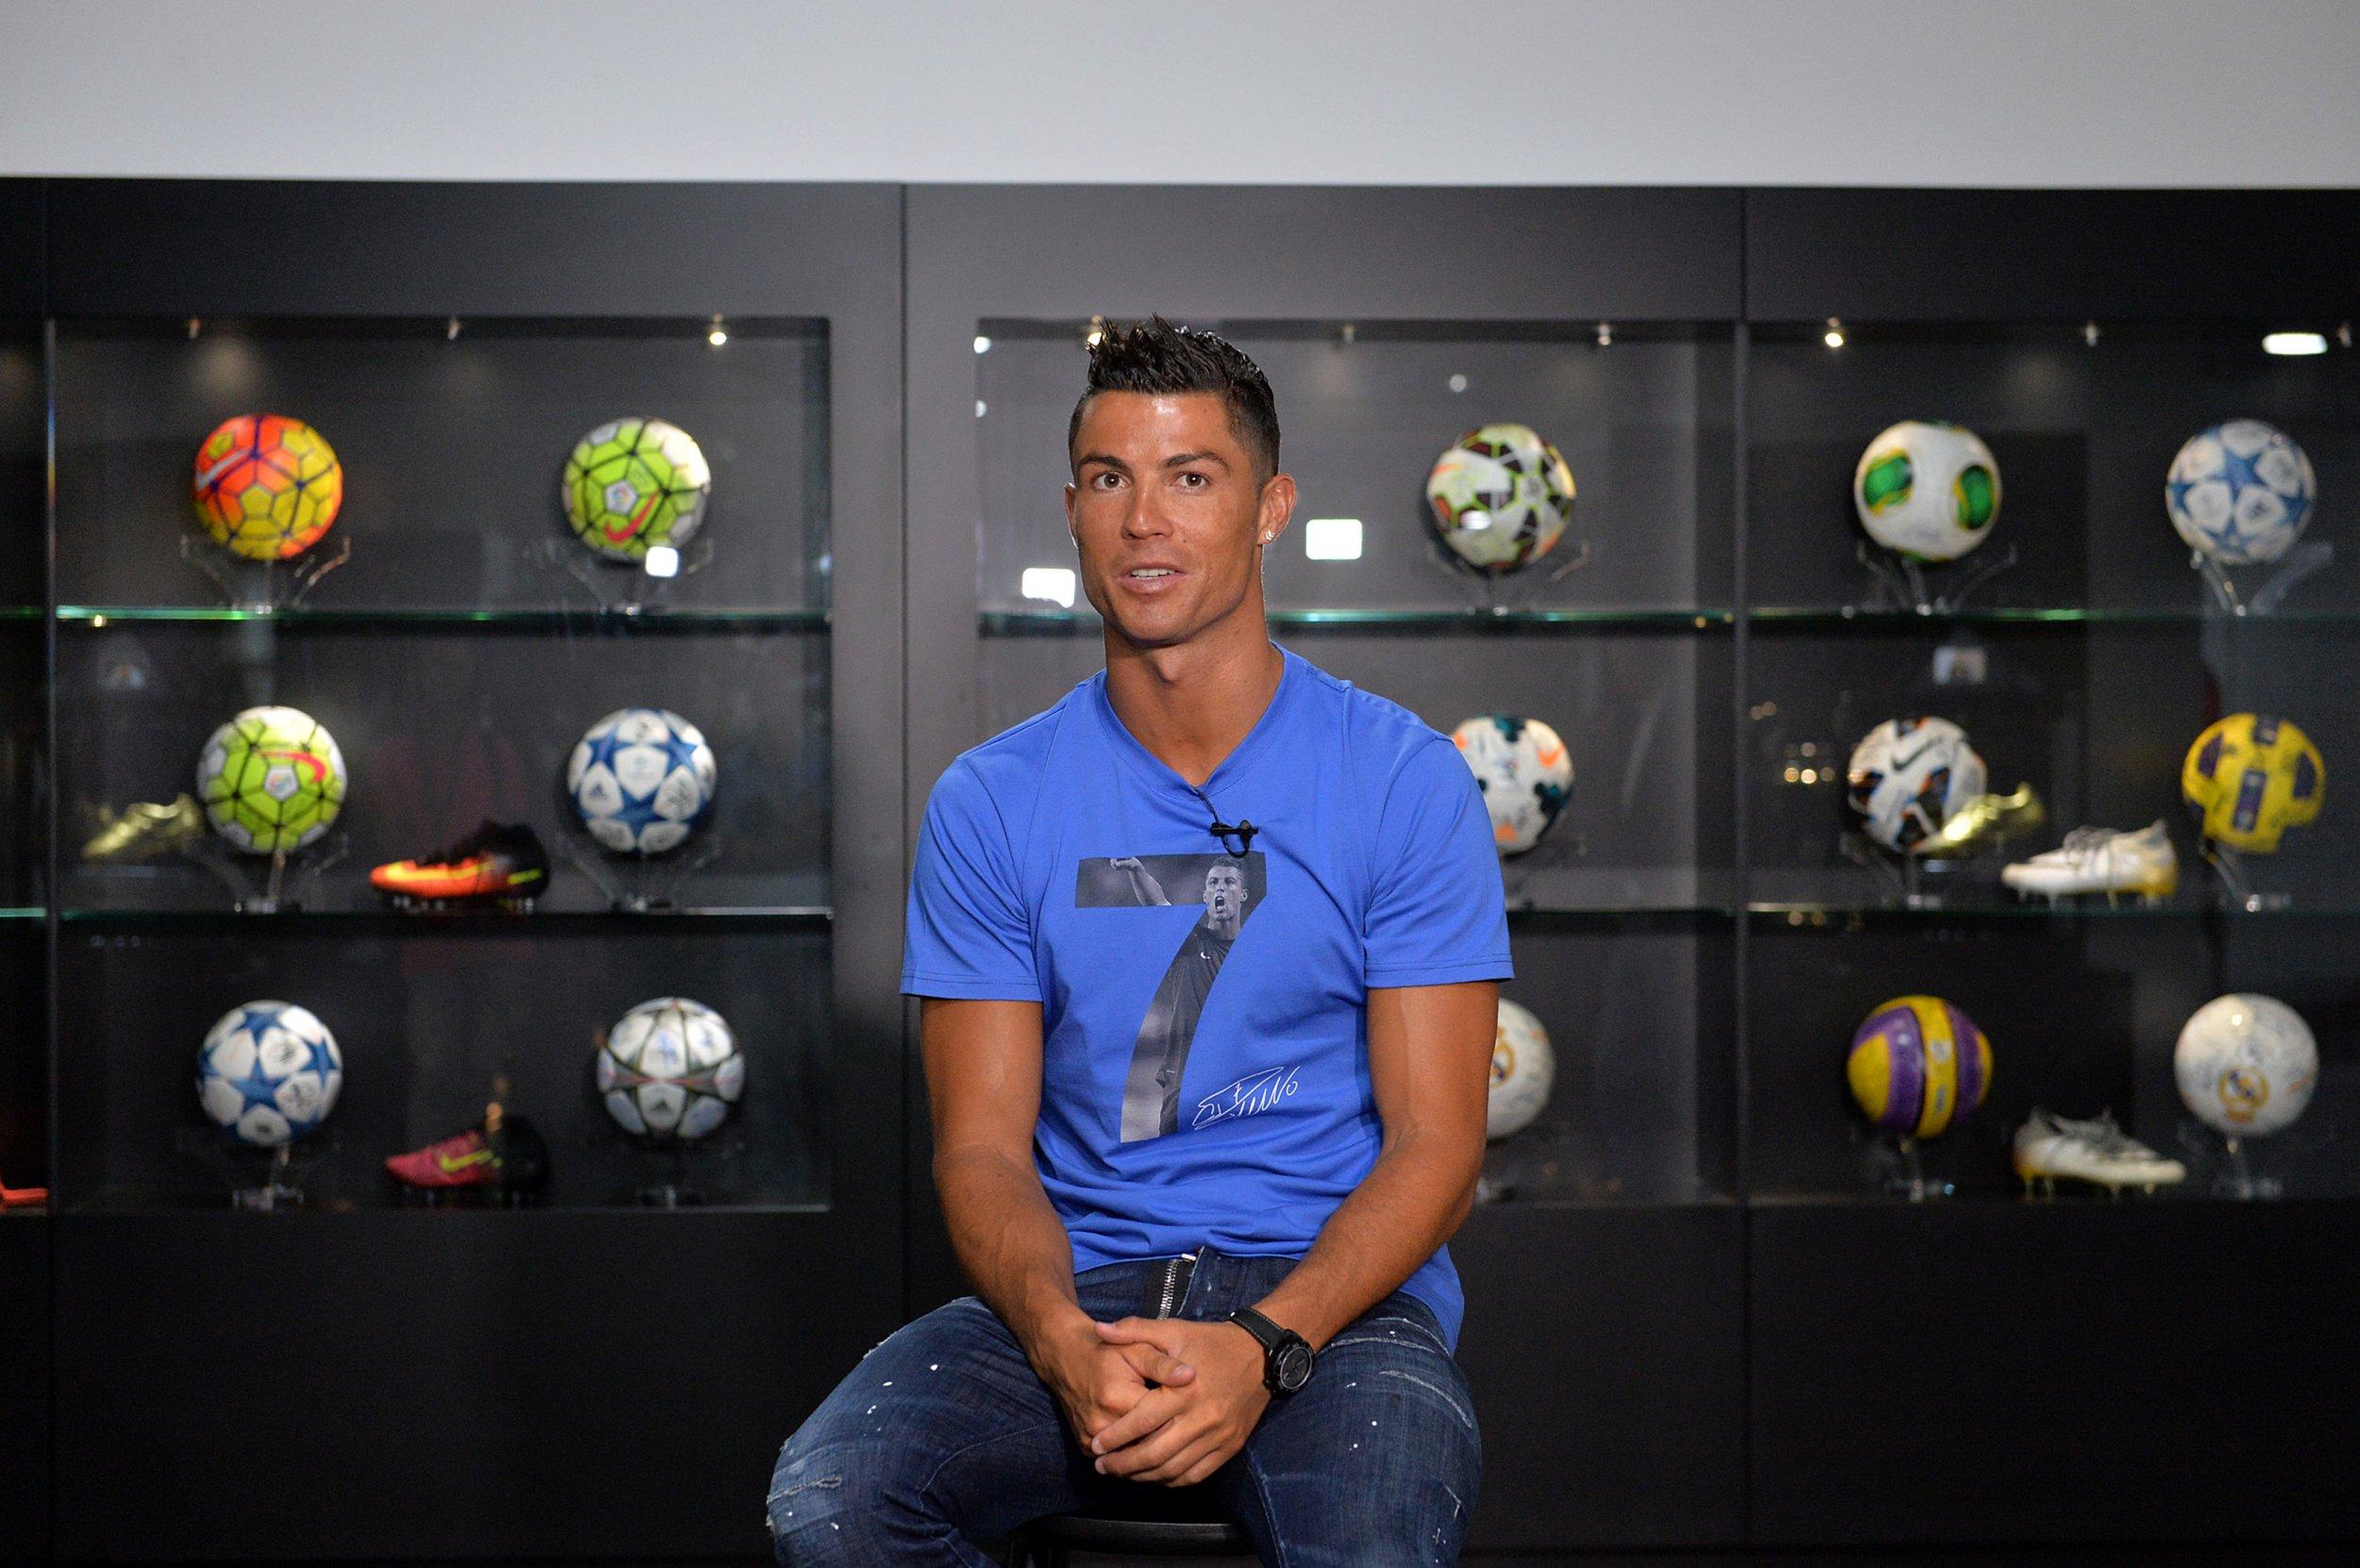 Watch Cristiano Ronaldo Plays A Policeman On Instagram